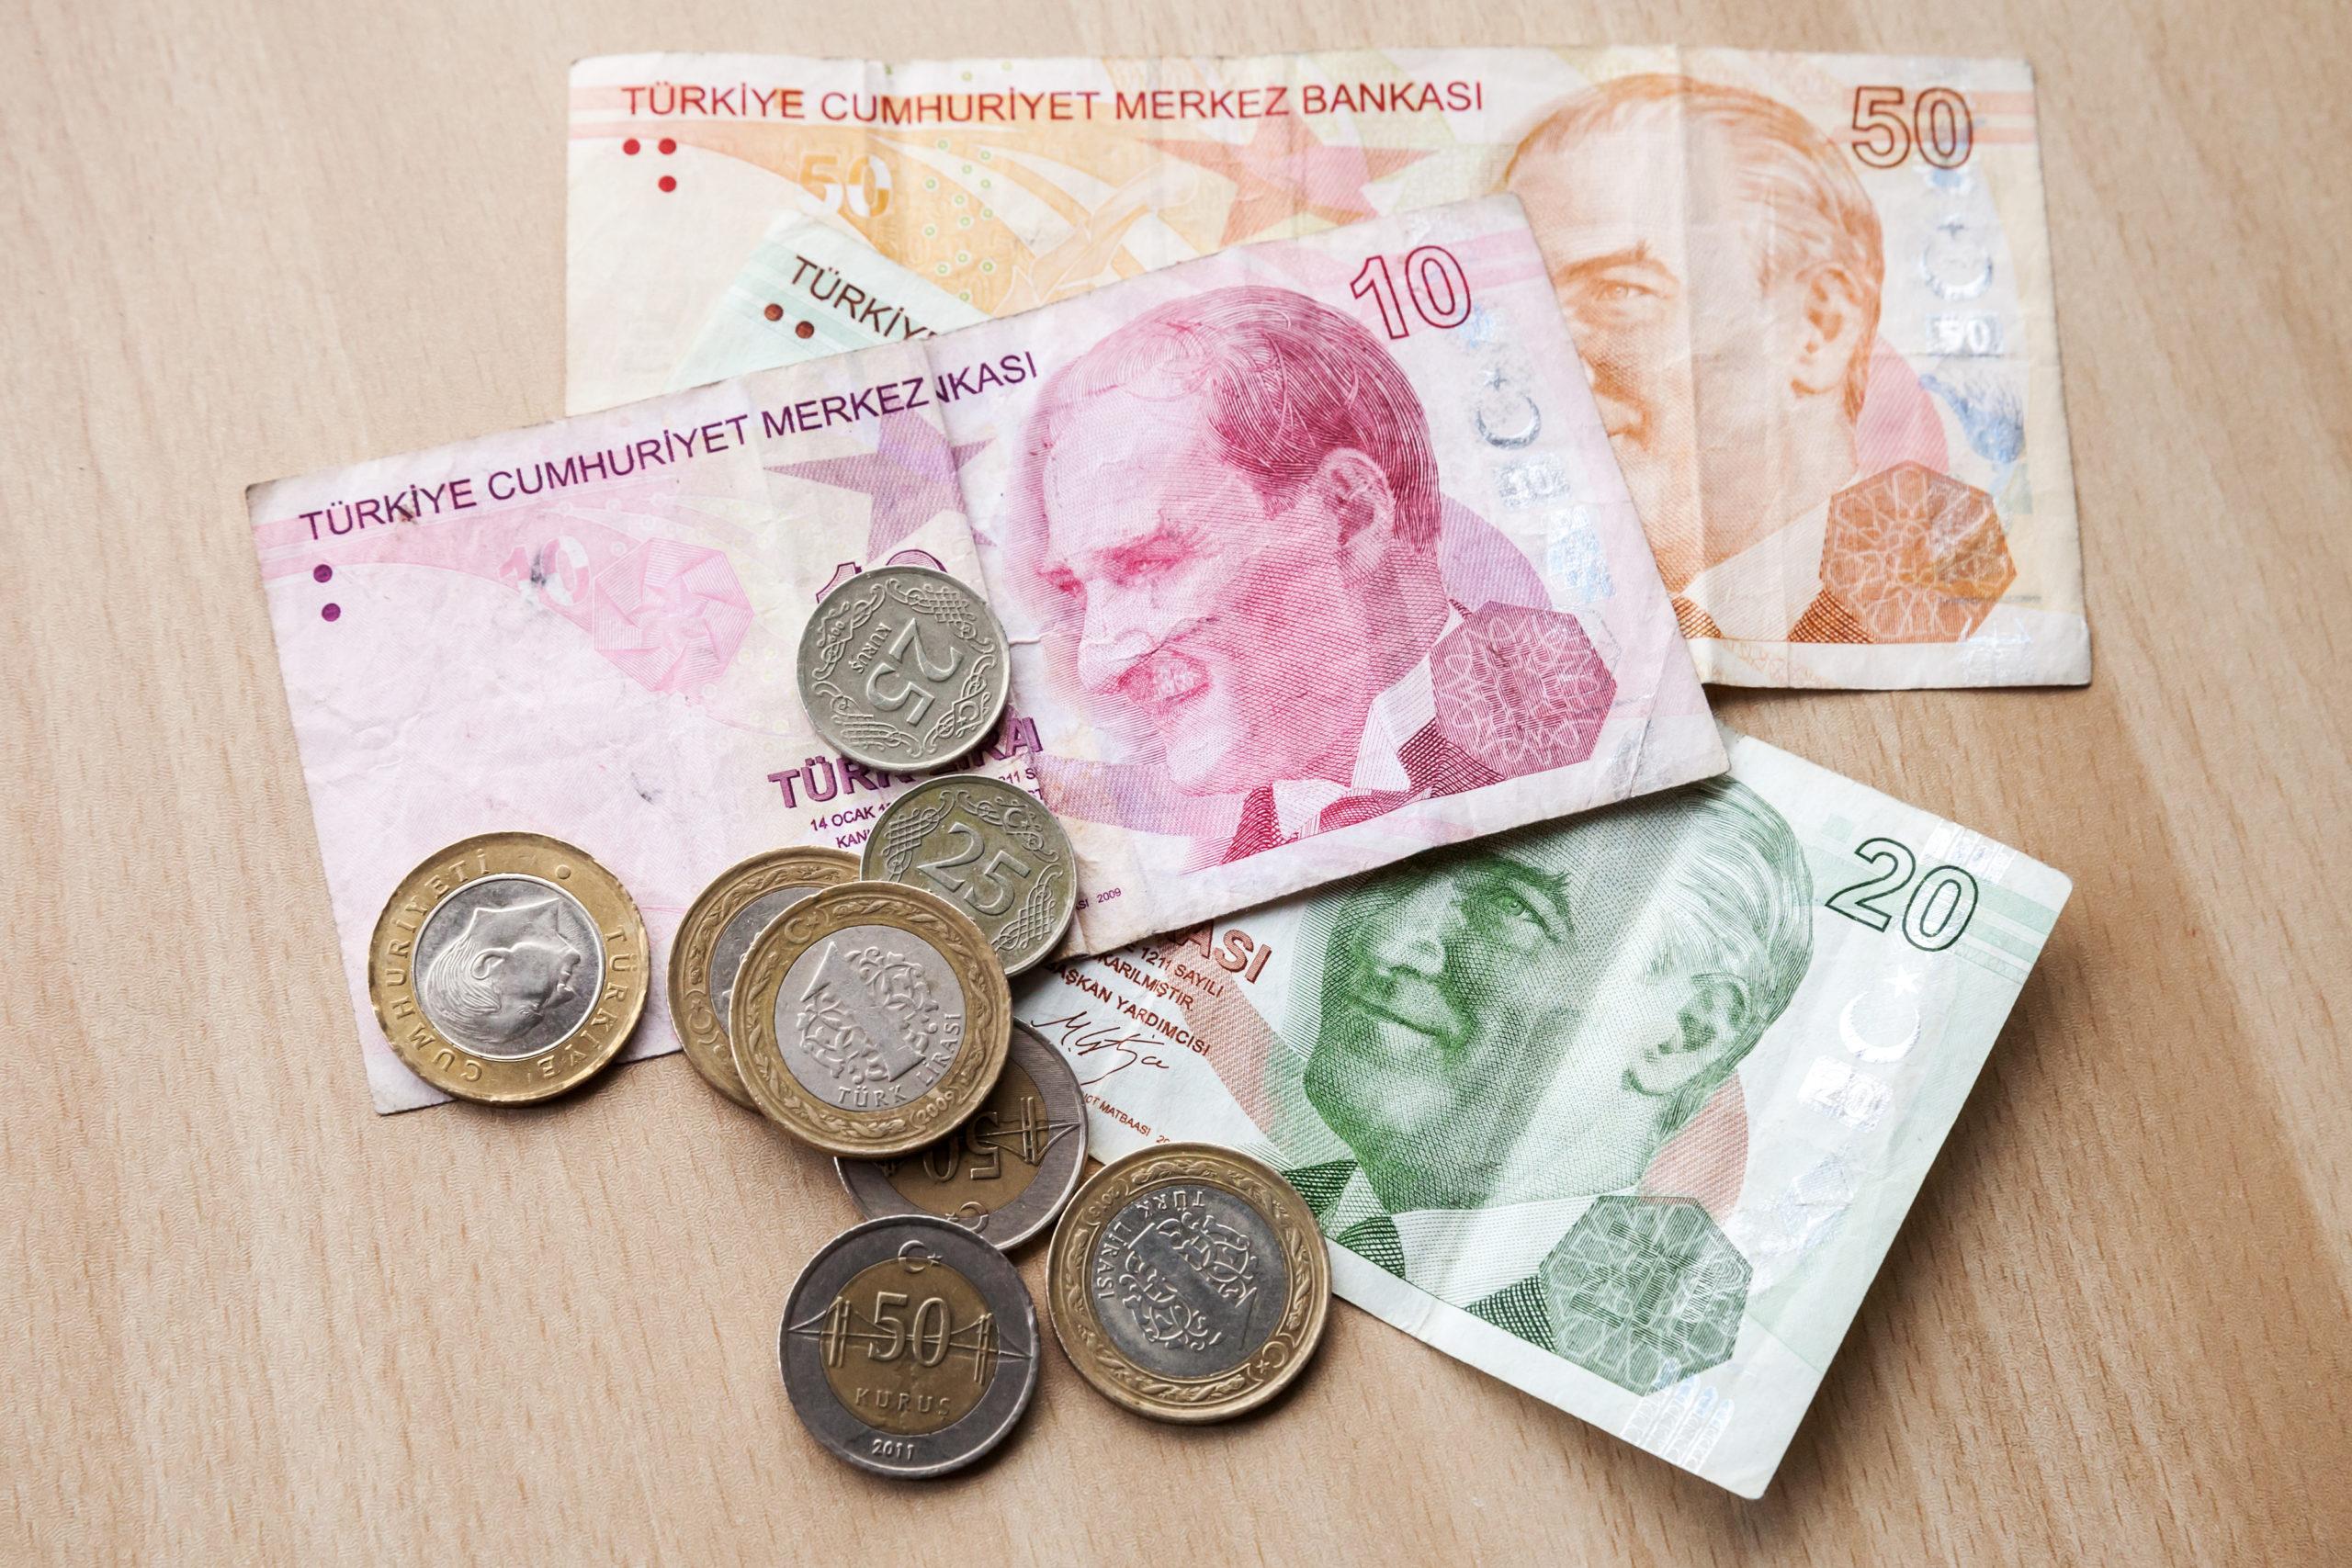 valjuta turcii 2021 kurs k rublju kakuju valjutu brat gde snimat